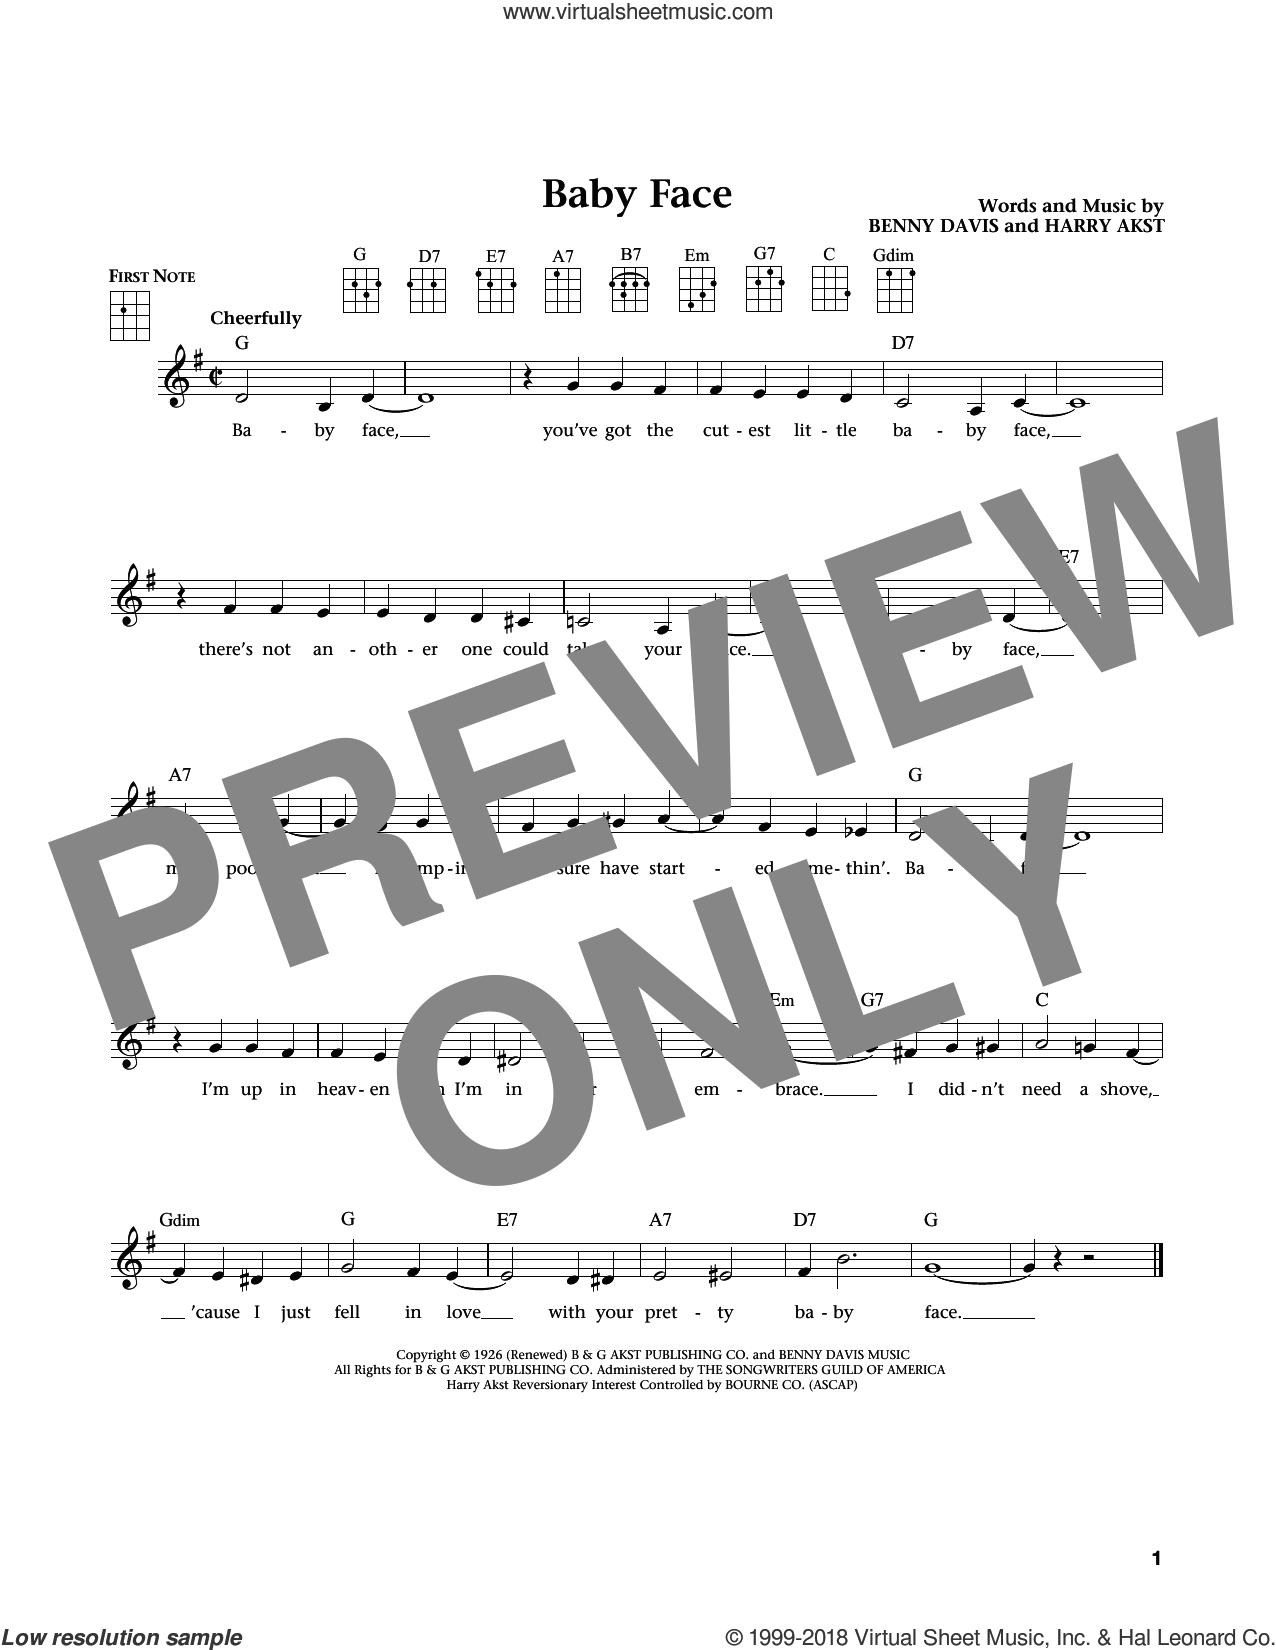 Baby Face (from The Daily Ukulele) (arr. Liz and Jim Beloff) sheet music for ukulele by Little Richard, Jim Beloff, Liz Beloff, Bobby Darin, Benny Davis and Harry Akst, intermediate skill level